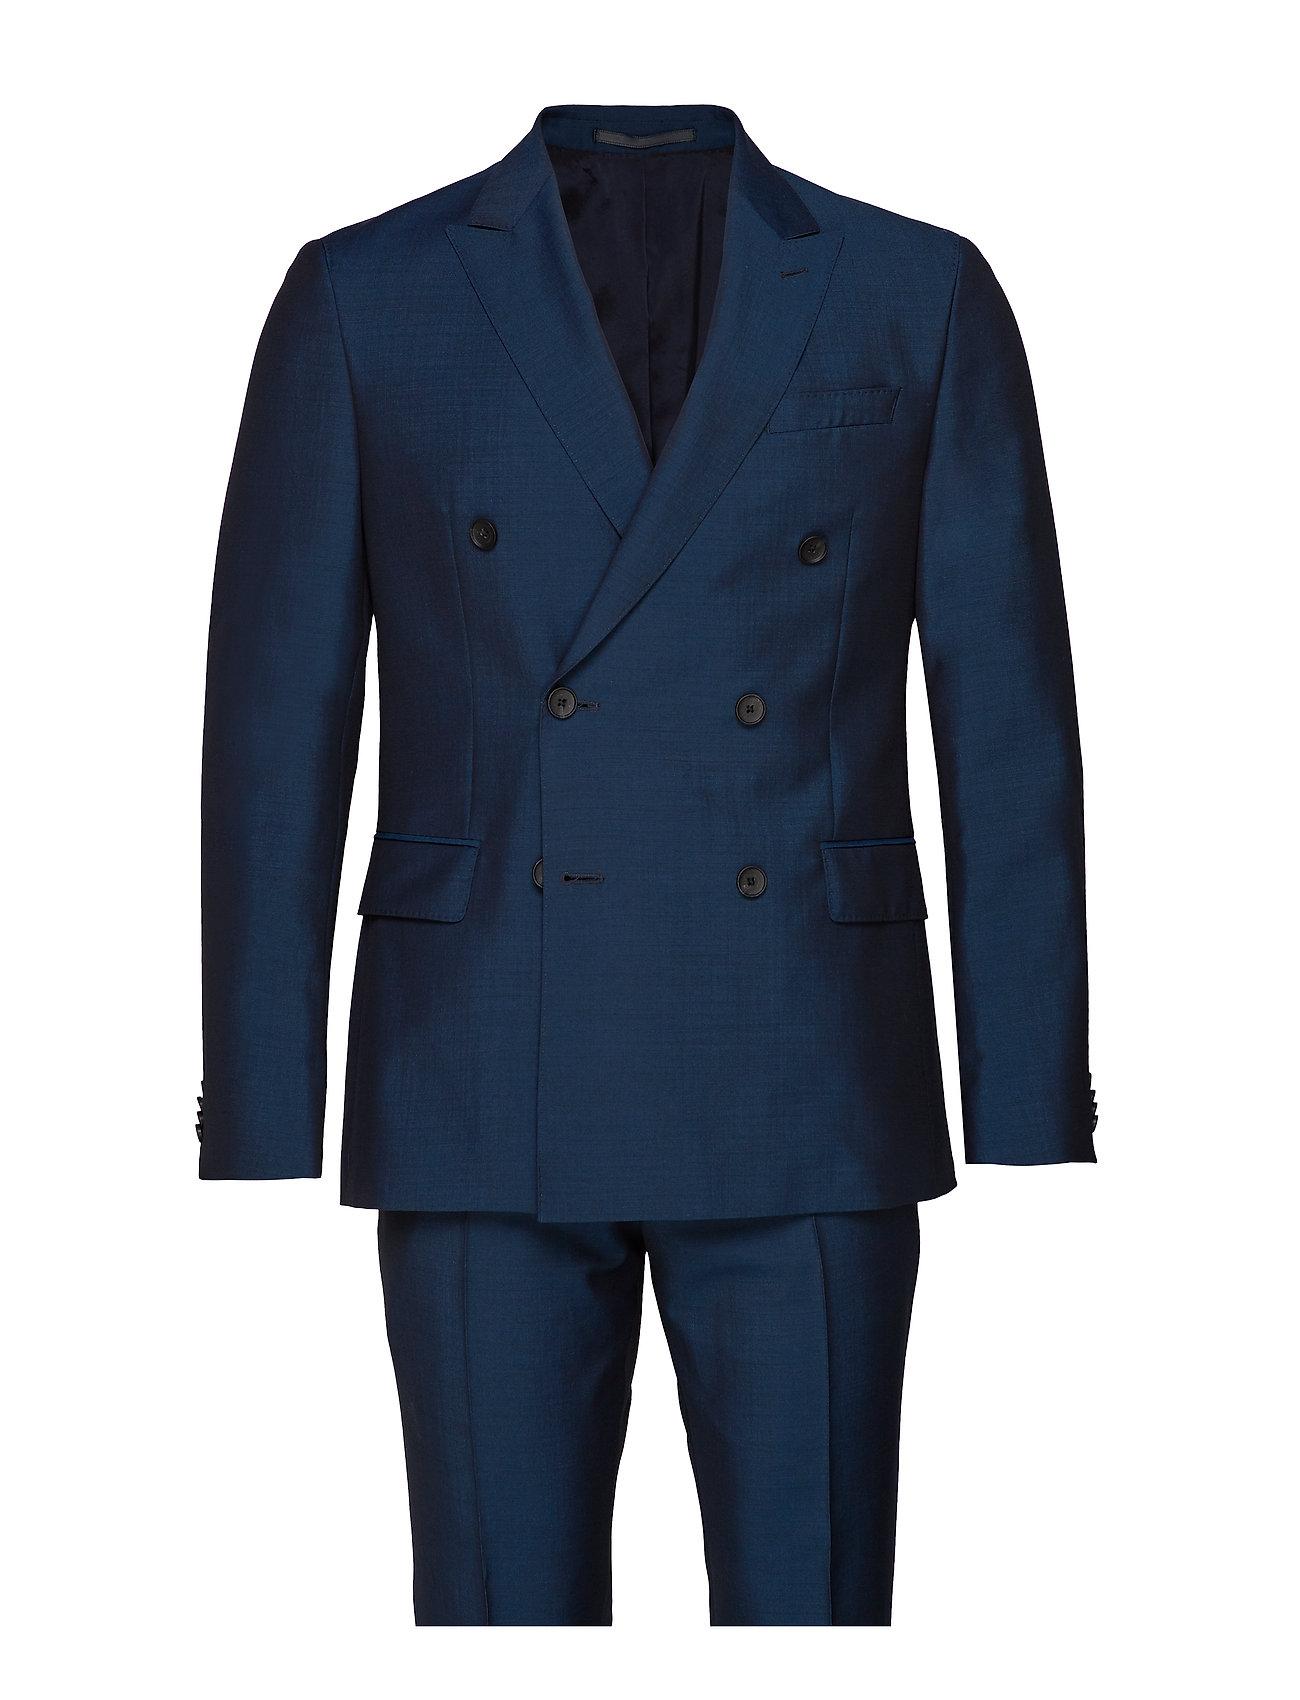 BOSS Business Namil1/Boit - DARK BLUE